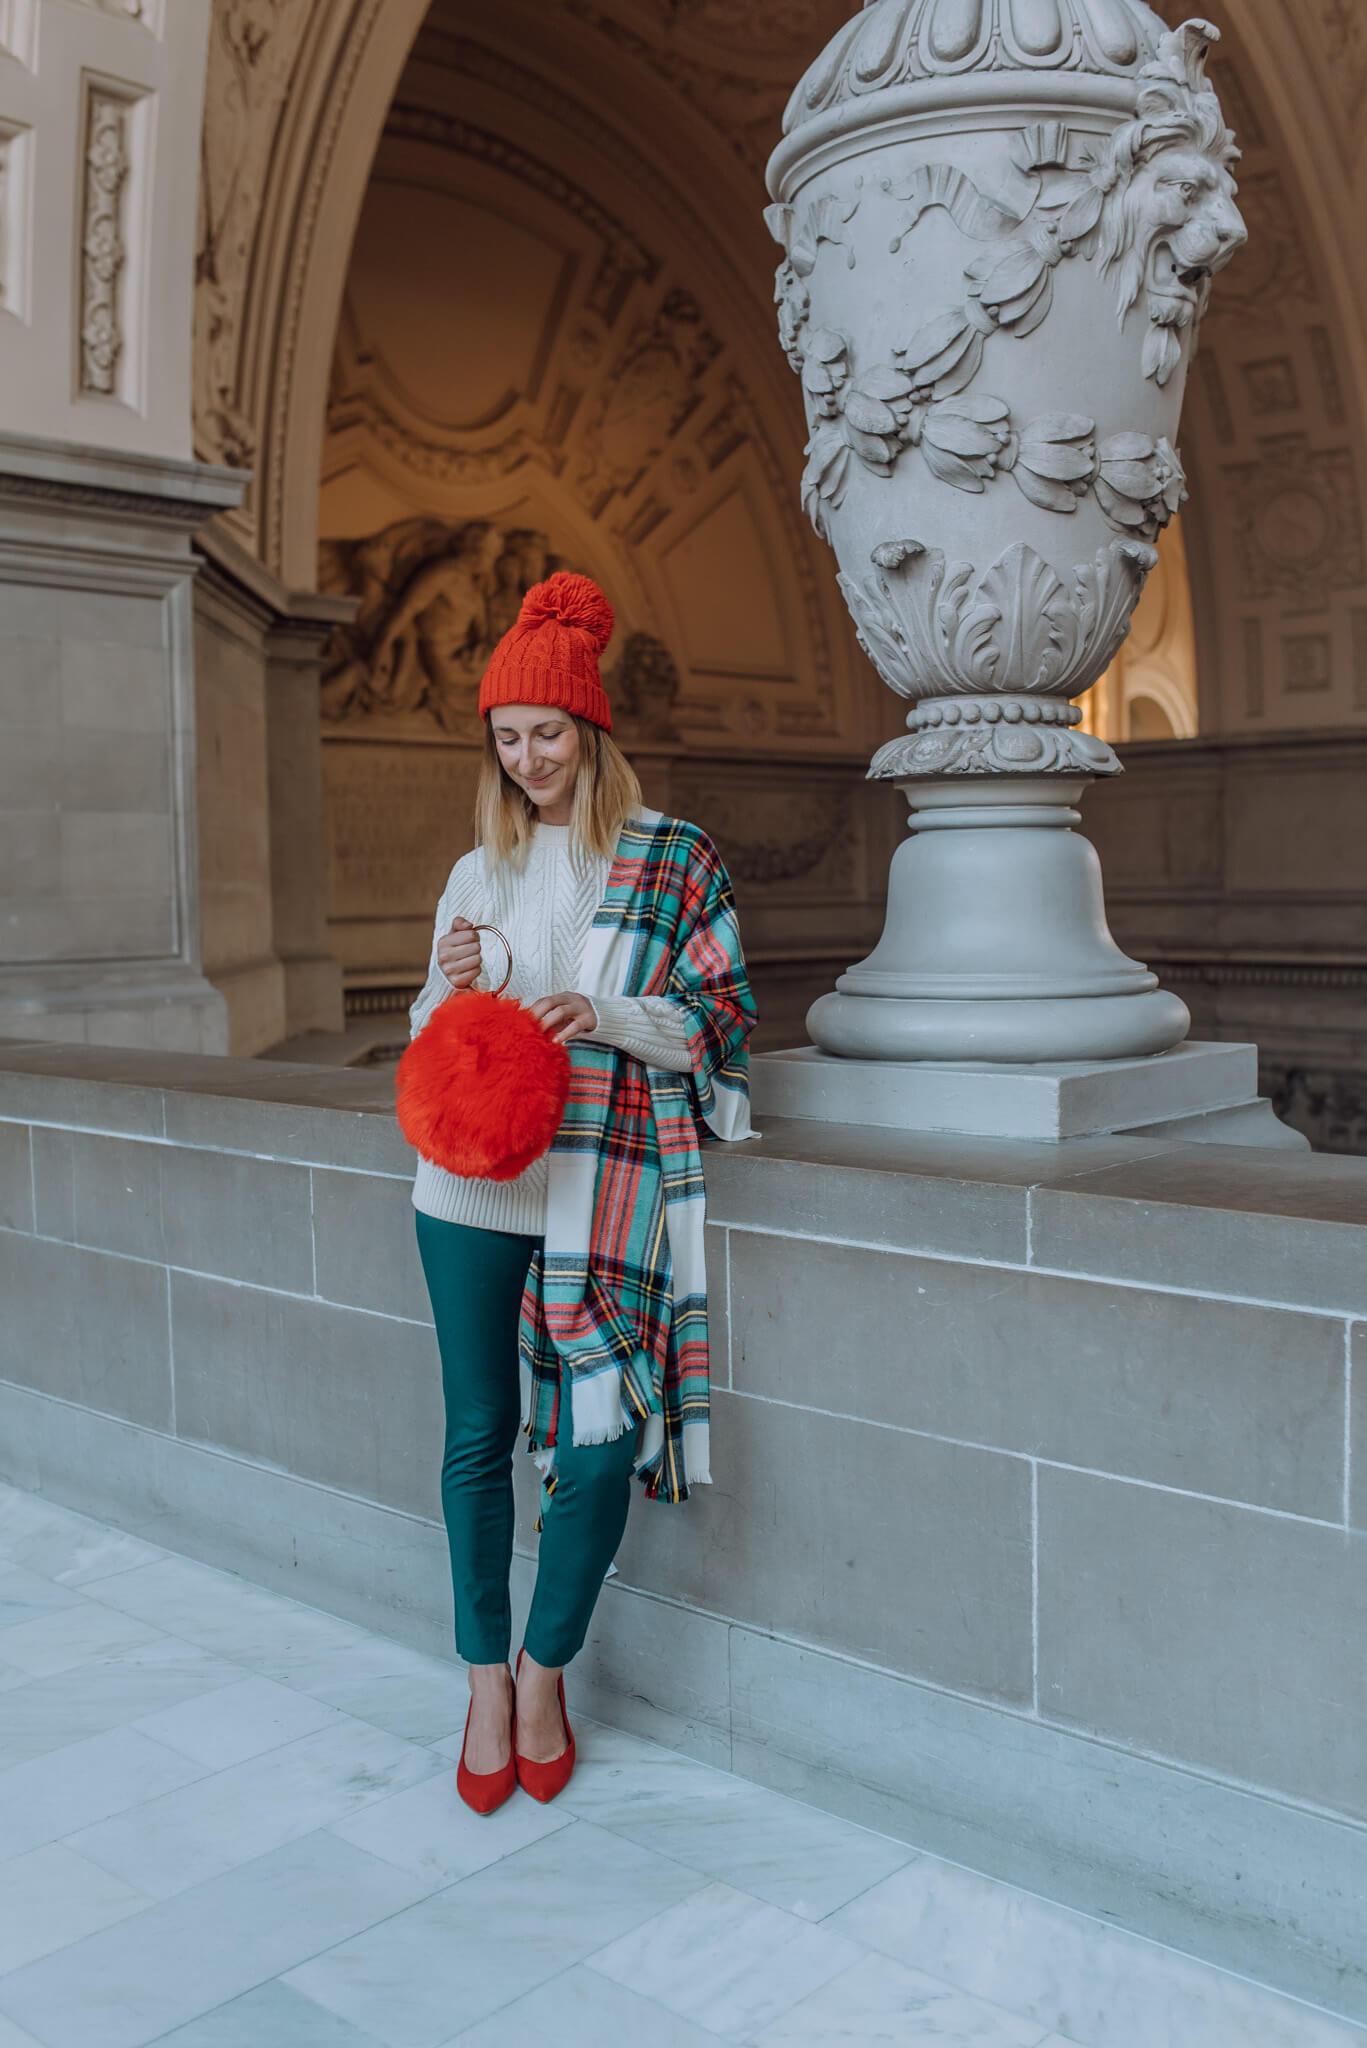 SanFrancisco-fashionblogger.jpg